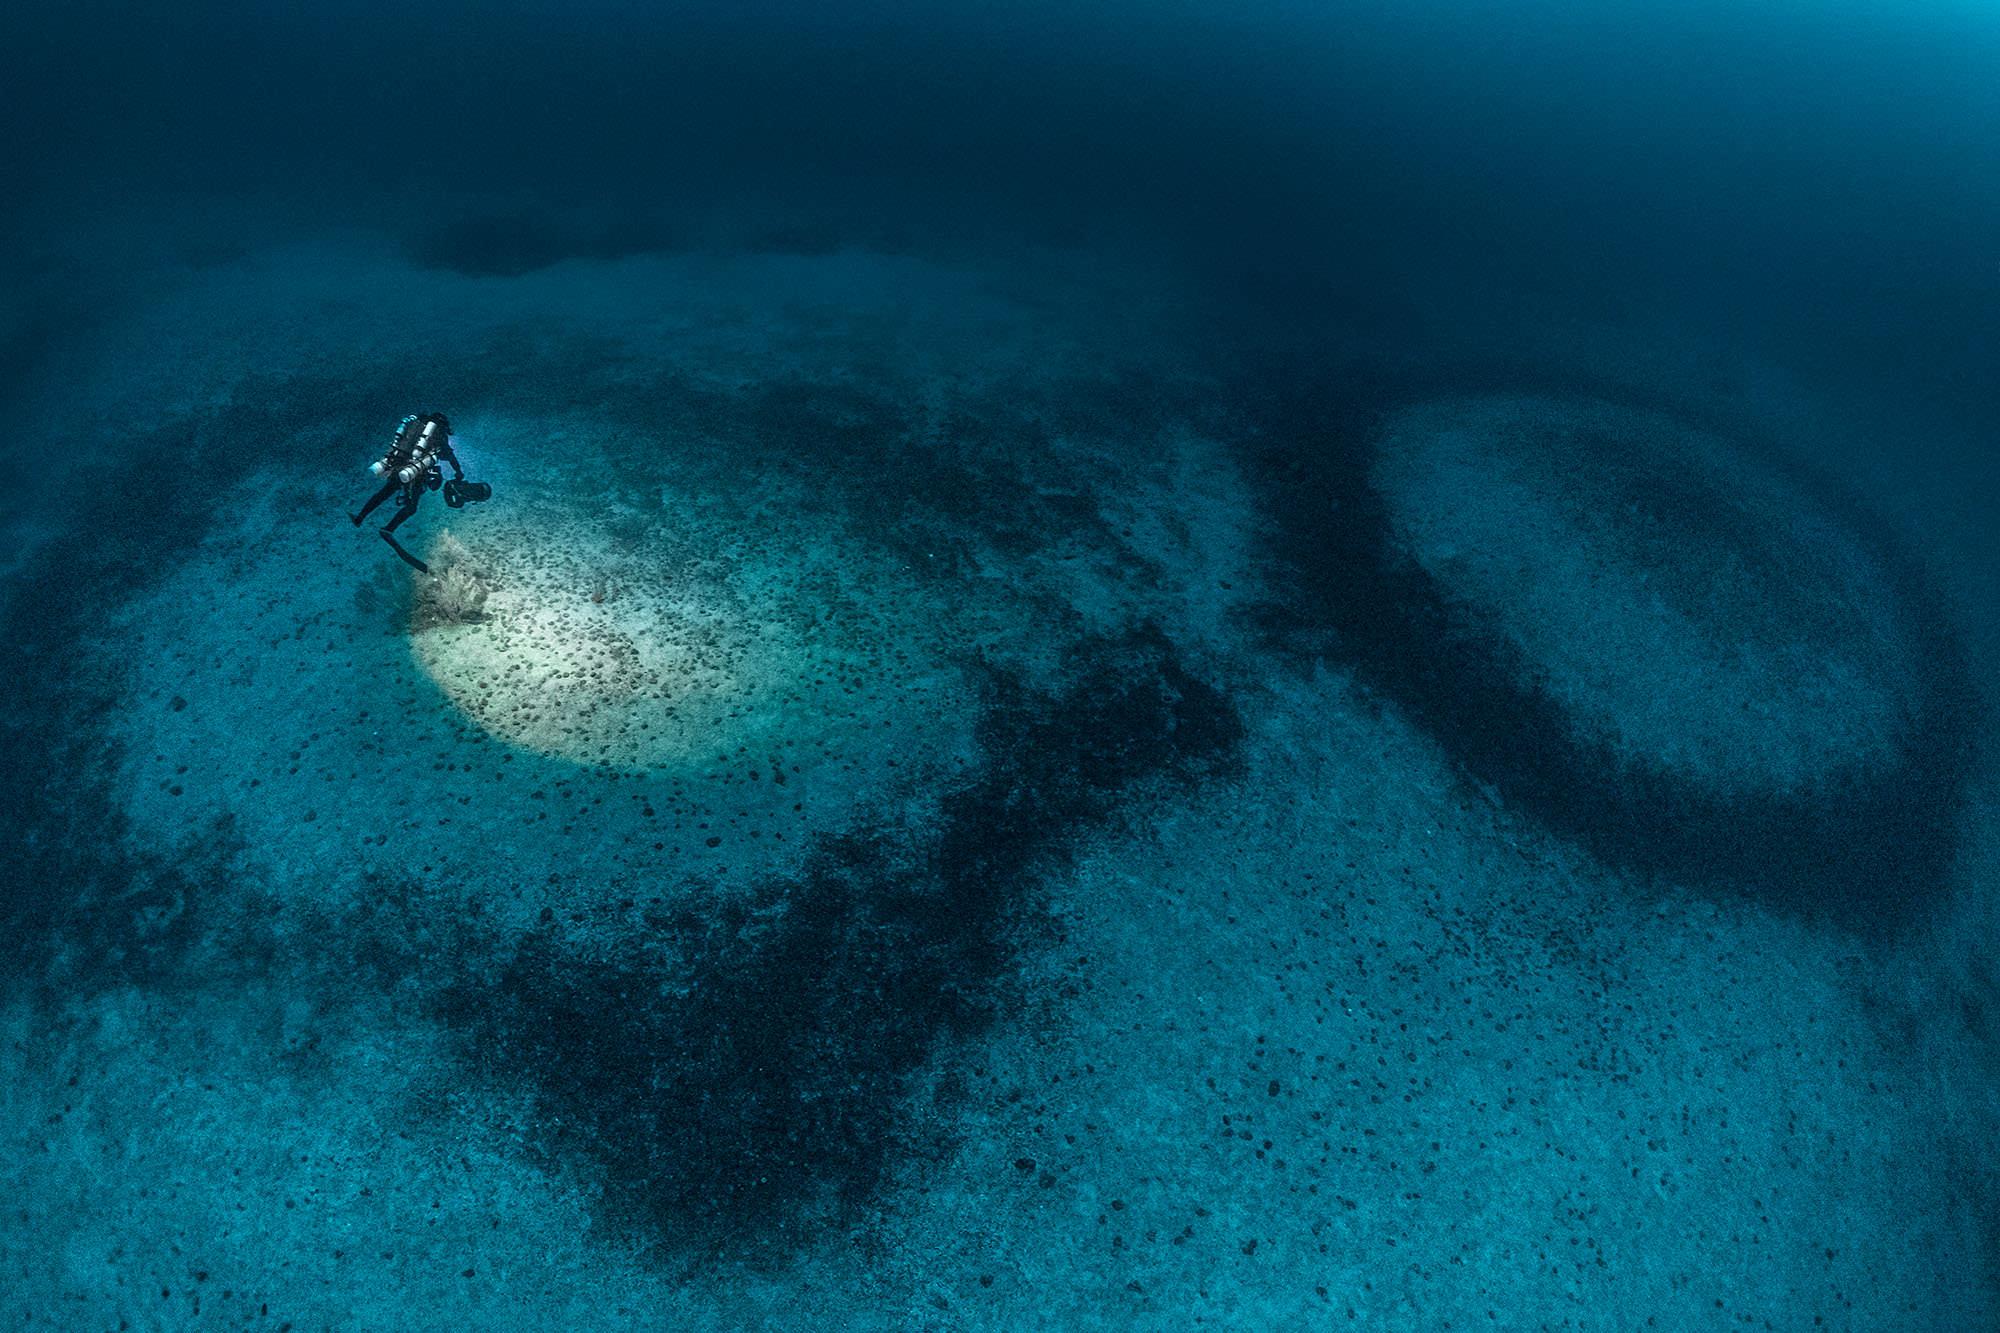 Coralligenous rings Claurent Ballesta Gombessa VI